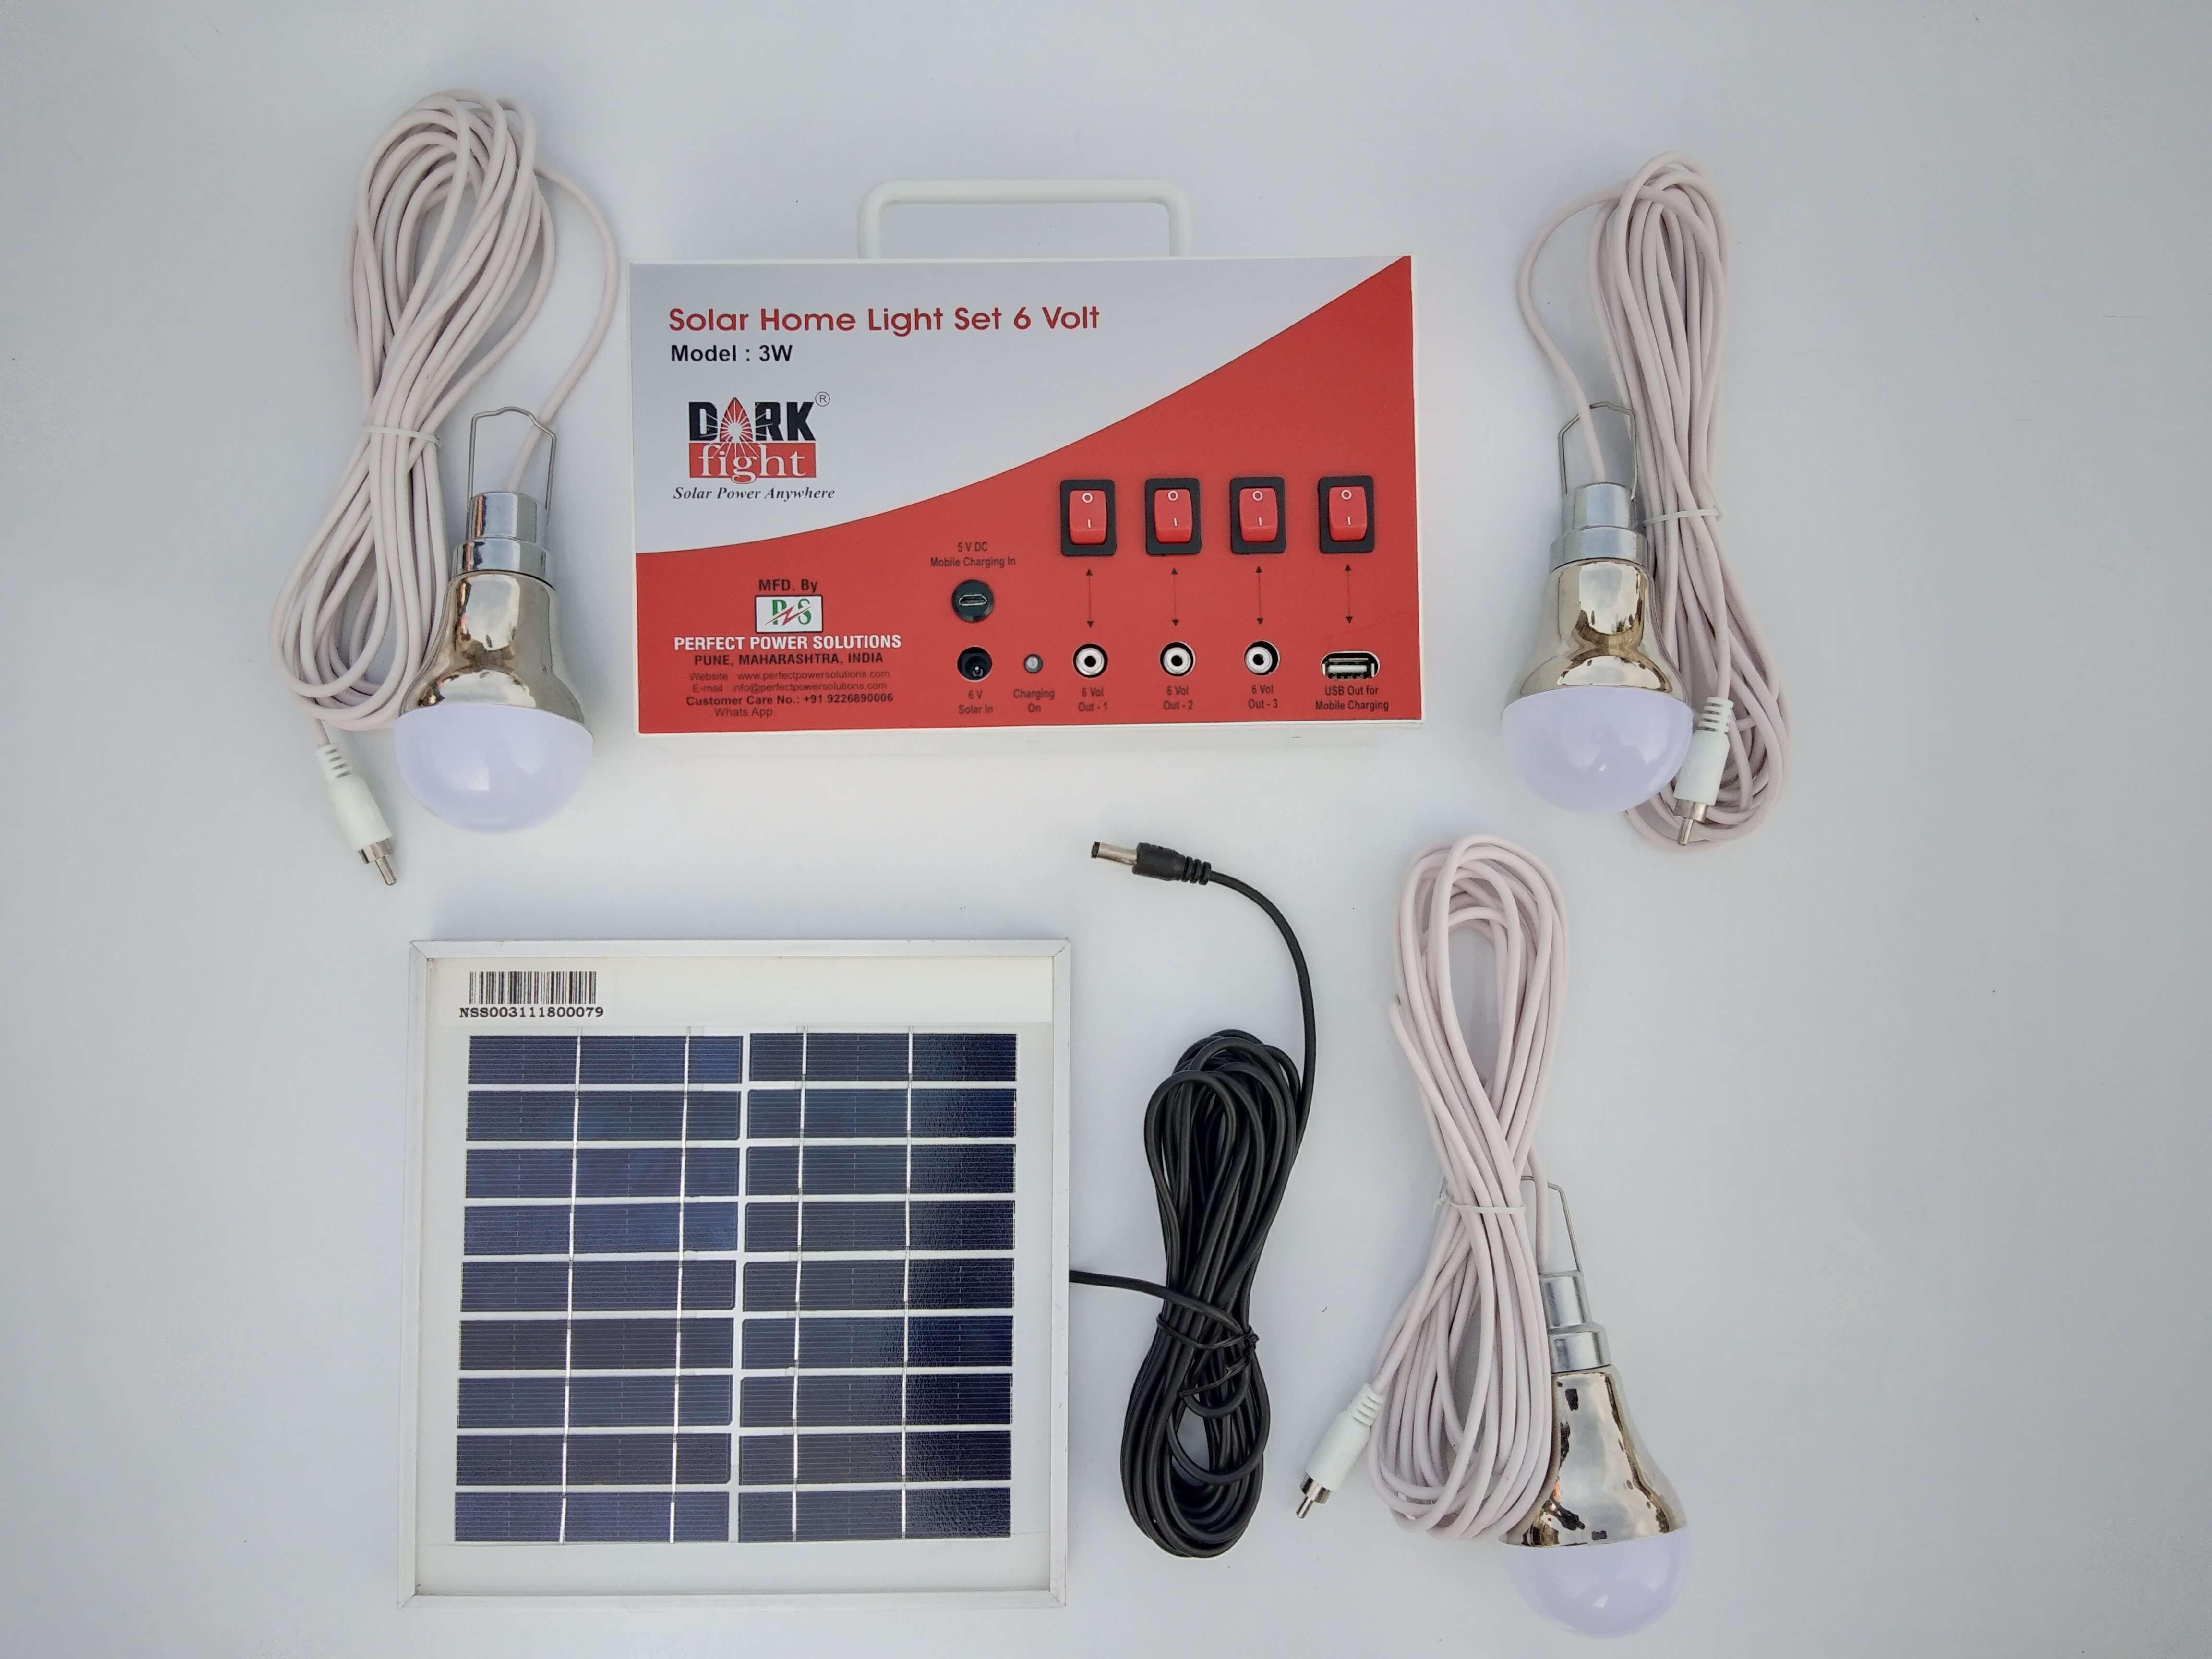 Solar Home Light Set 6 Volt